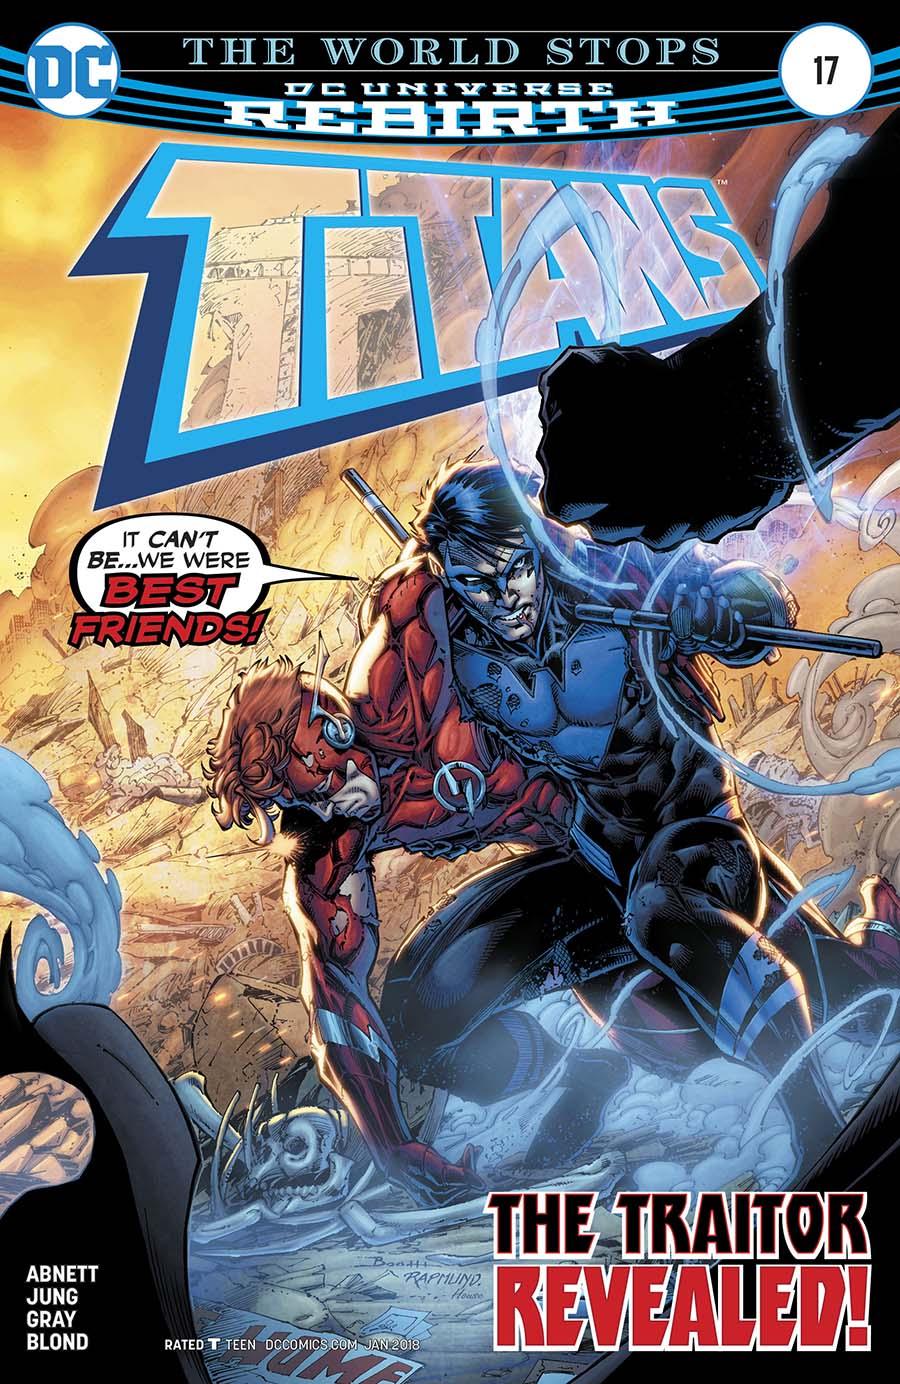 Titans Vol 3 #17 Cover A Regular Brett Booth & Norm Rapmund Cover